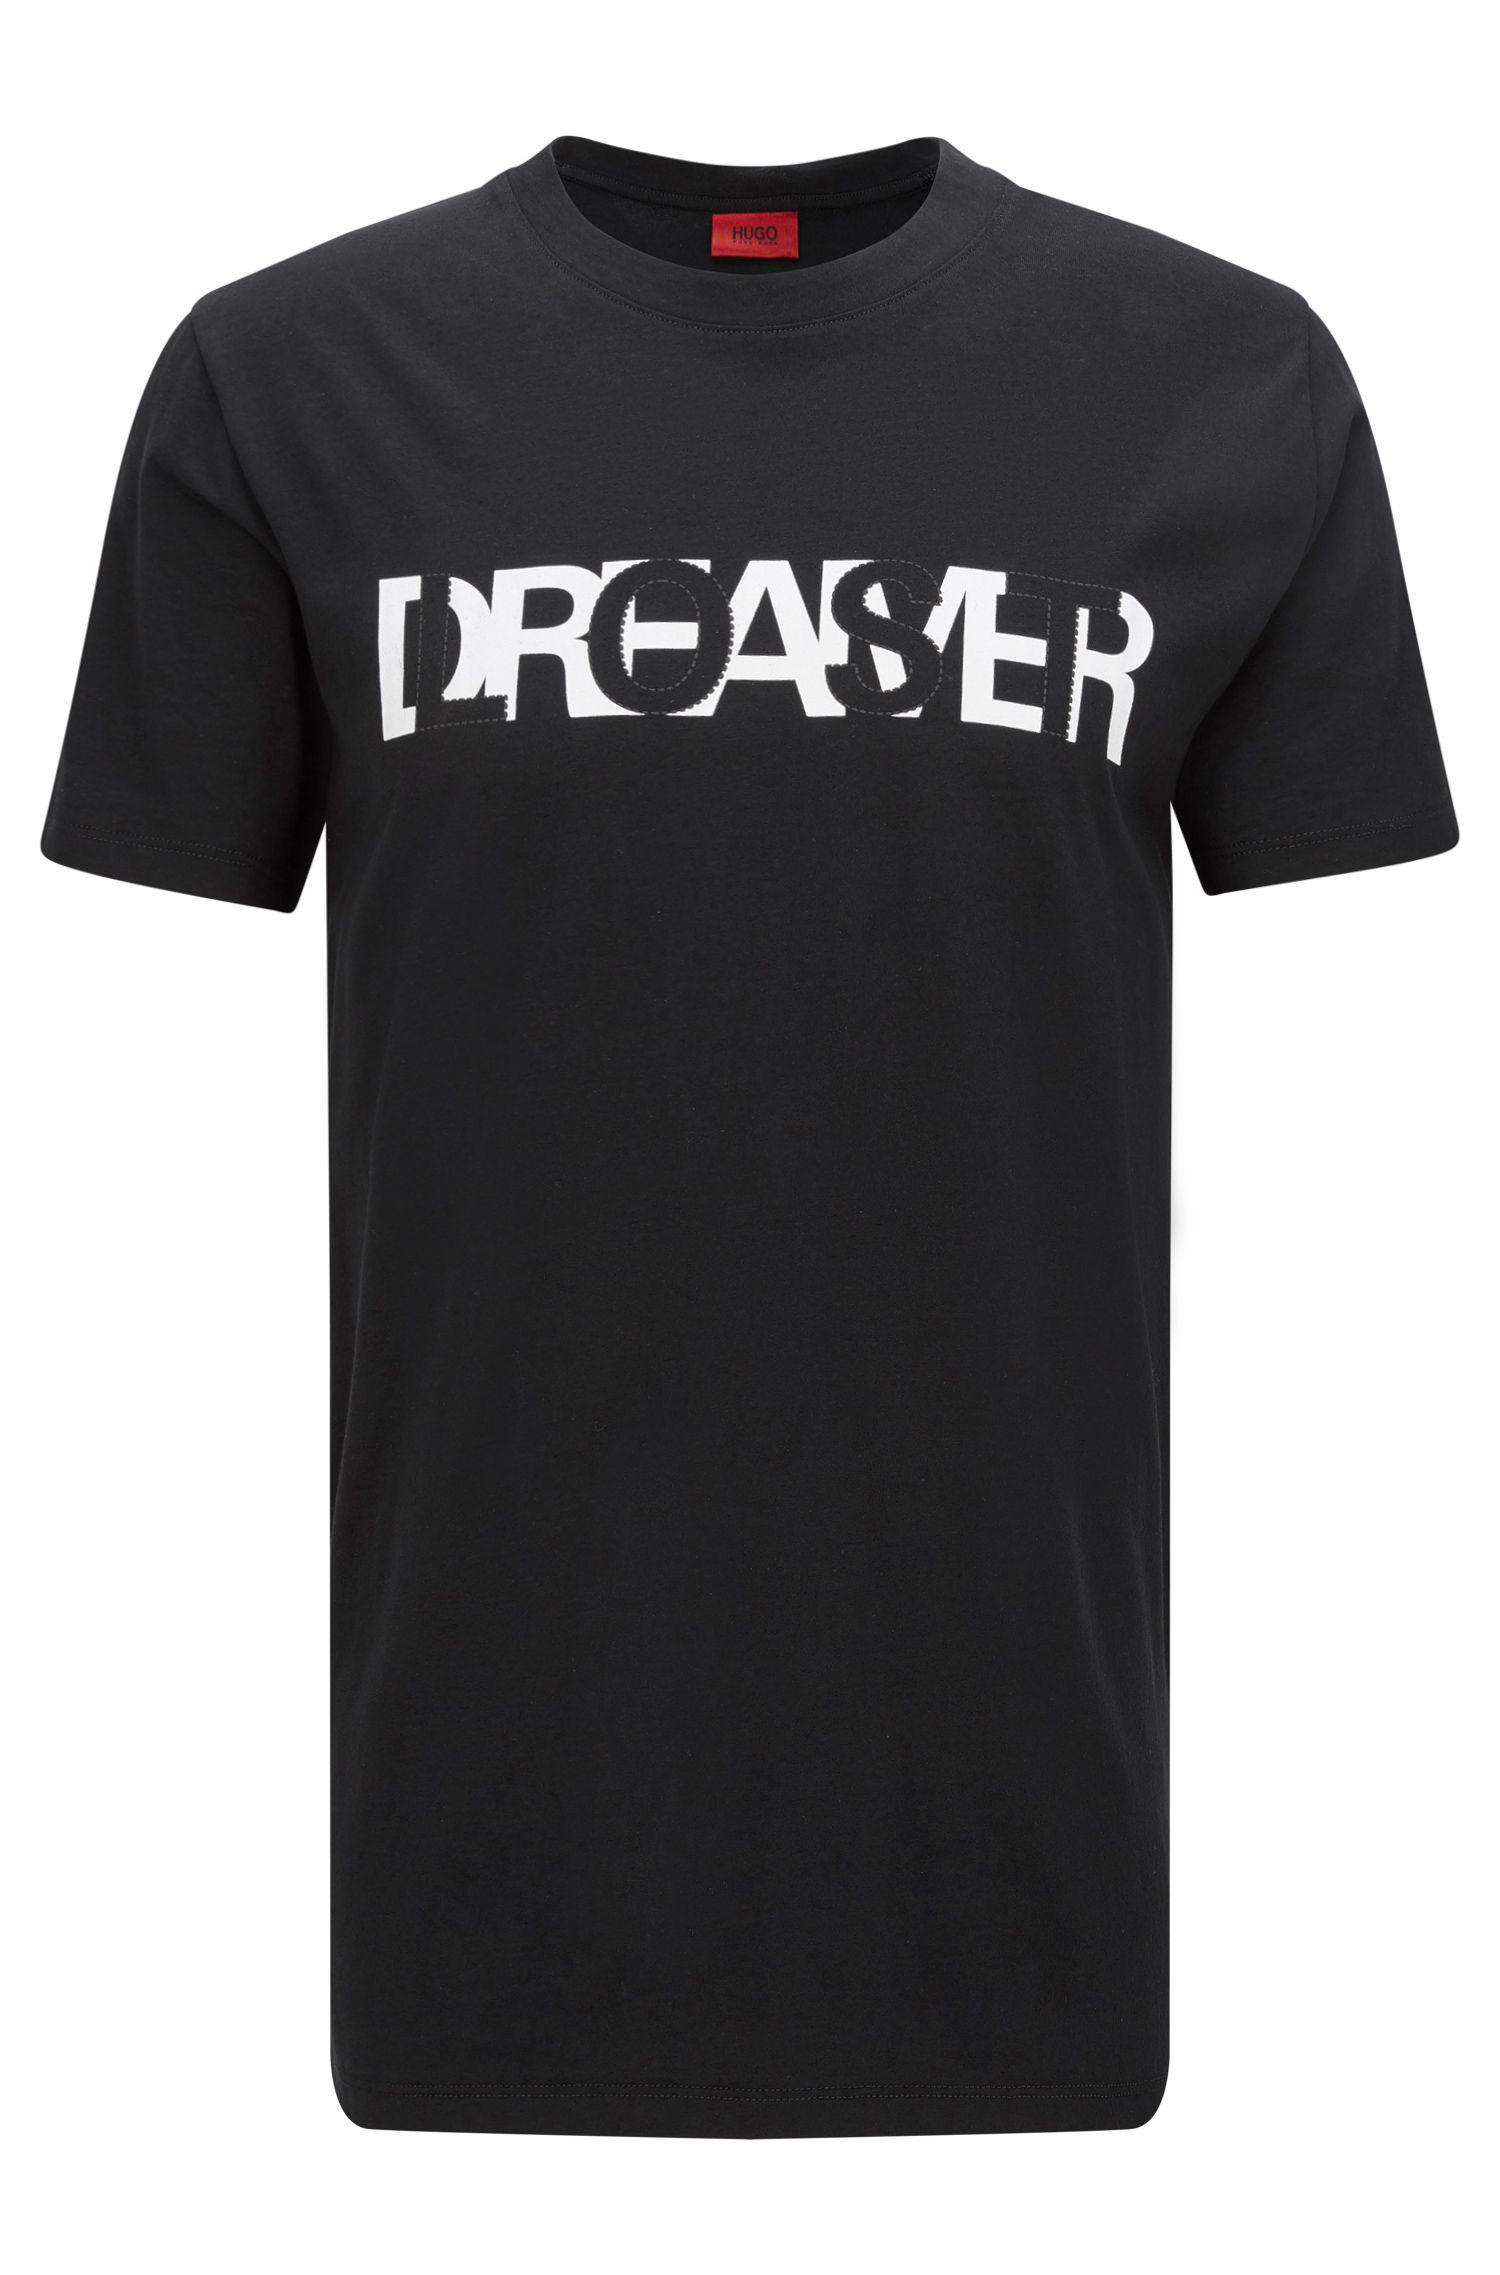 Relaxed-Fit T-Shirt aus Baumwolle mit Kontrast-Print